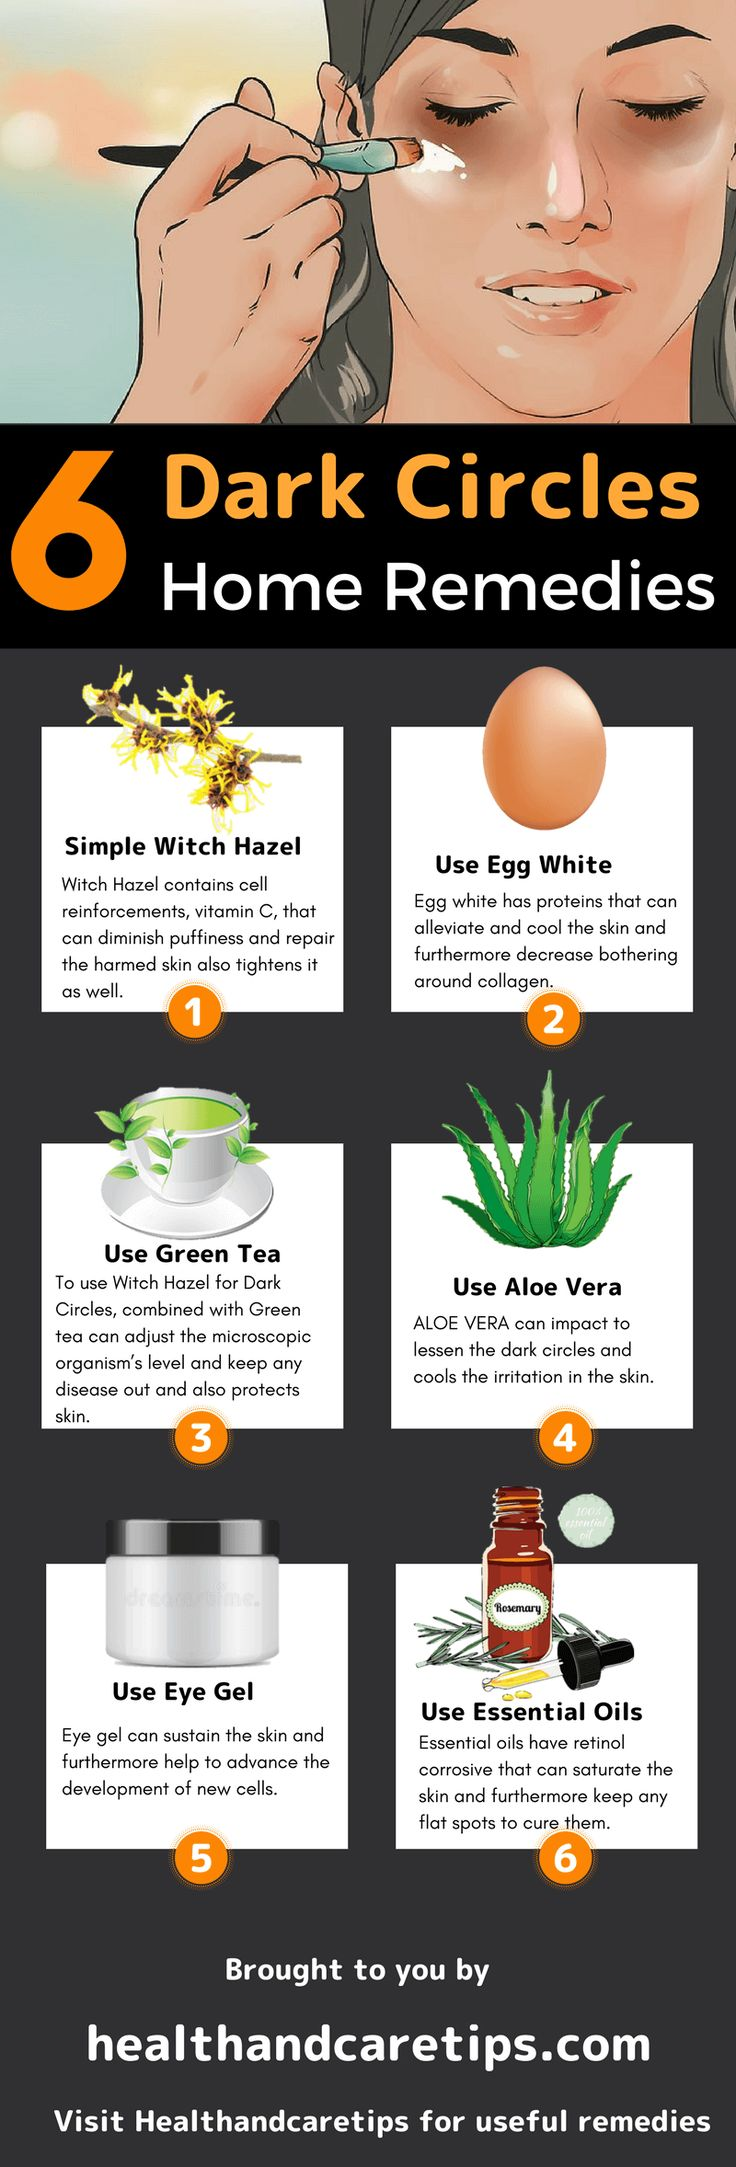 6 DIY Home Remedies of Witch Hazel for Dark Circles – TOP 6 Ways #DarkCirclesRemedyDIY